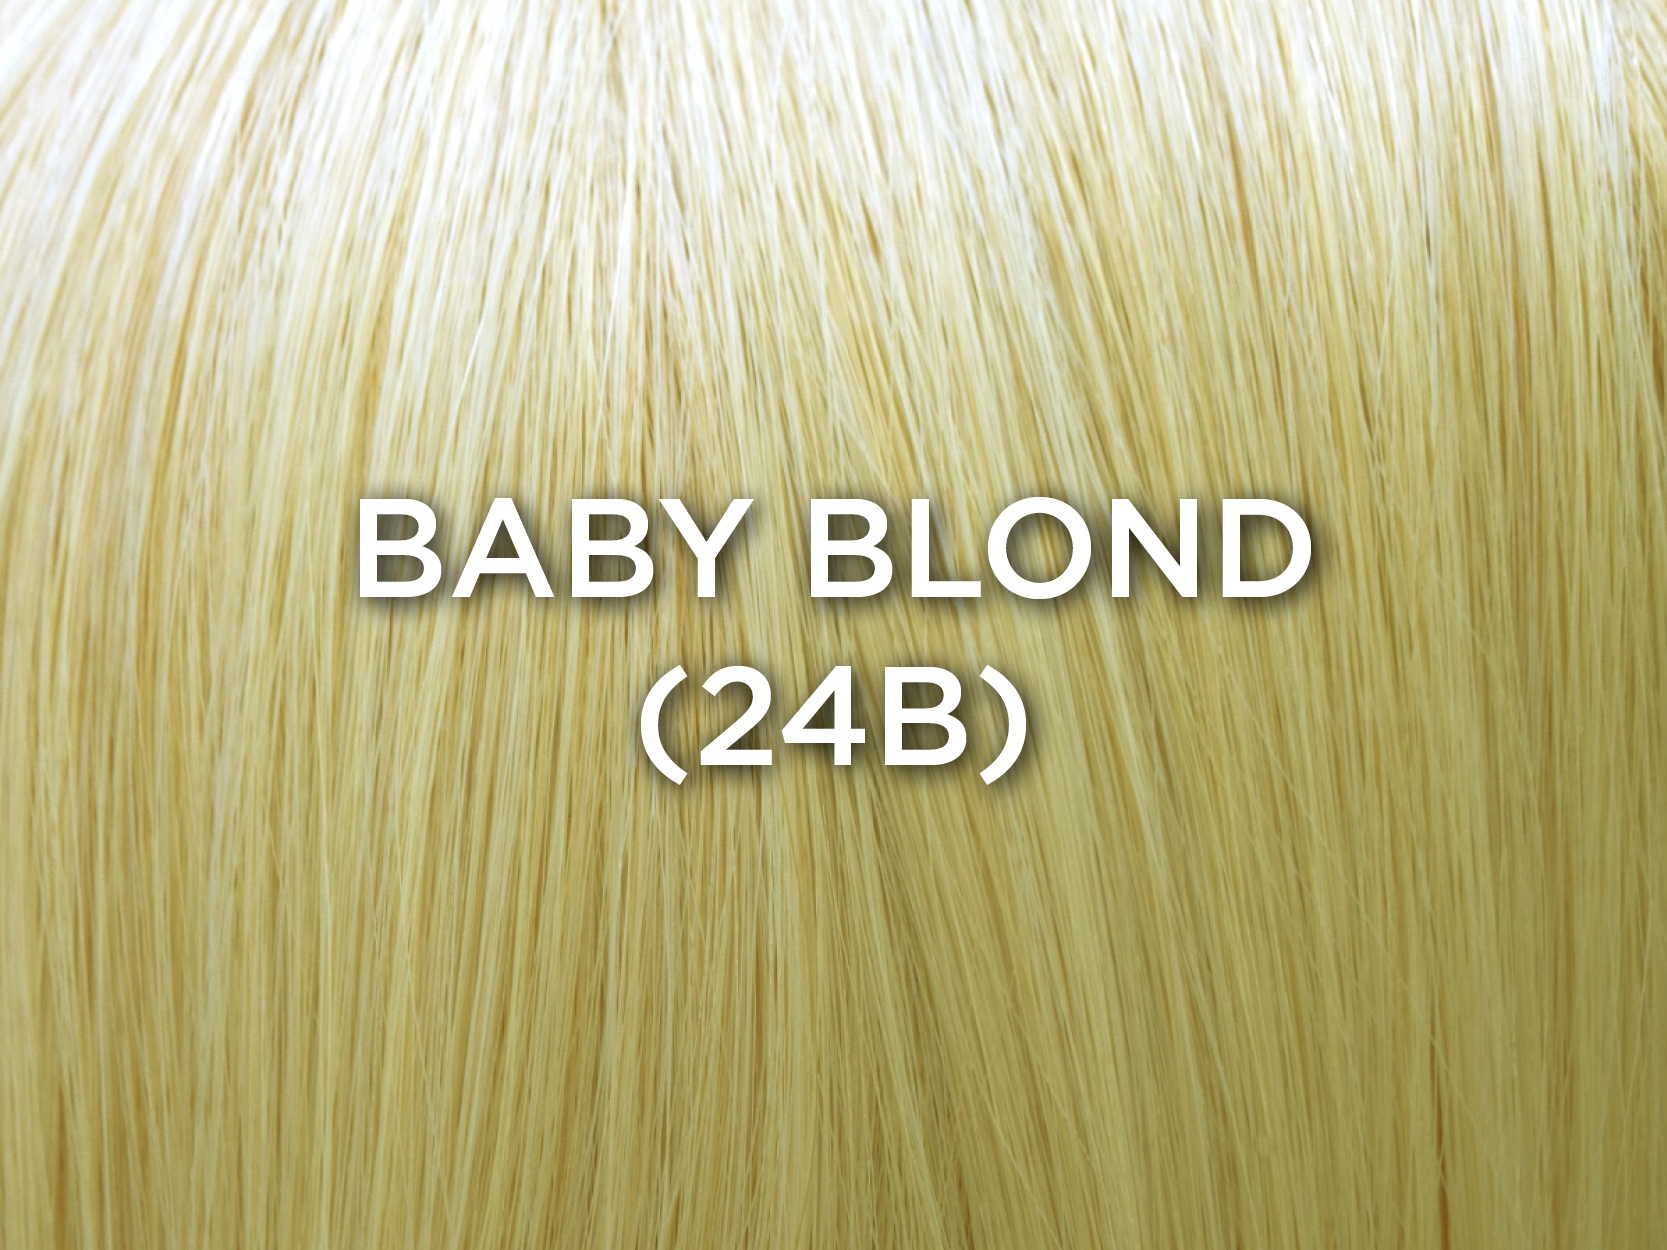 BabyBlond.jpg